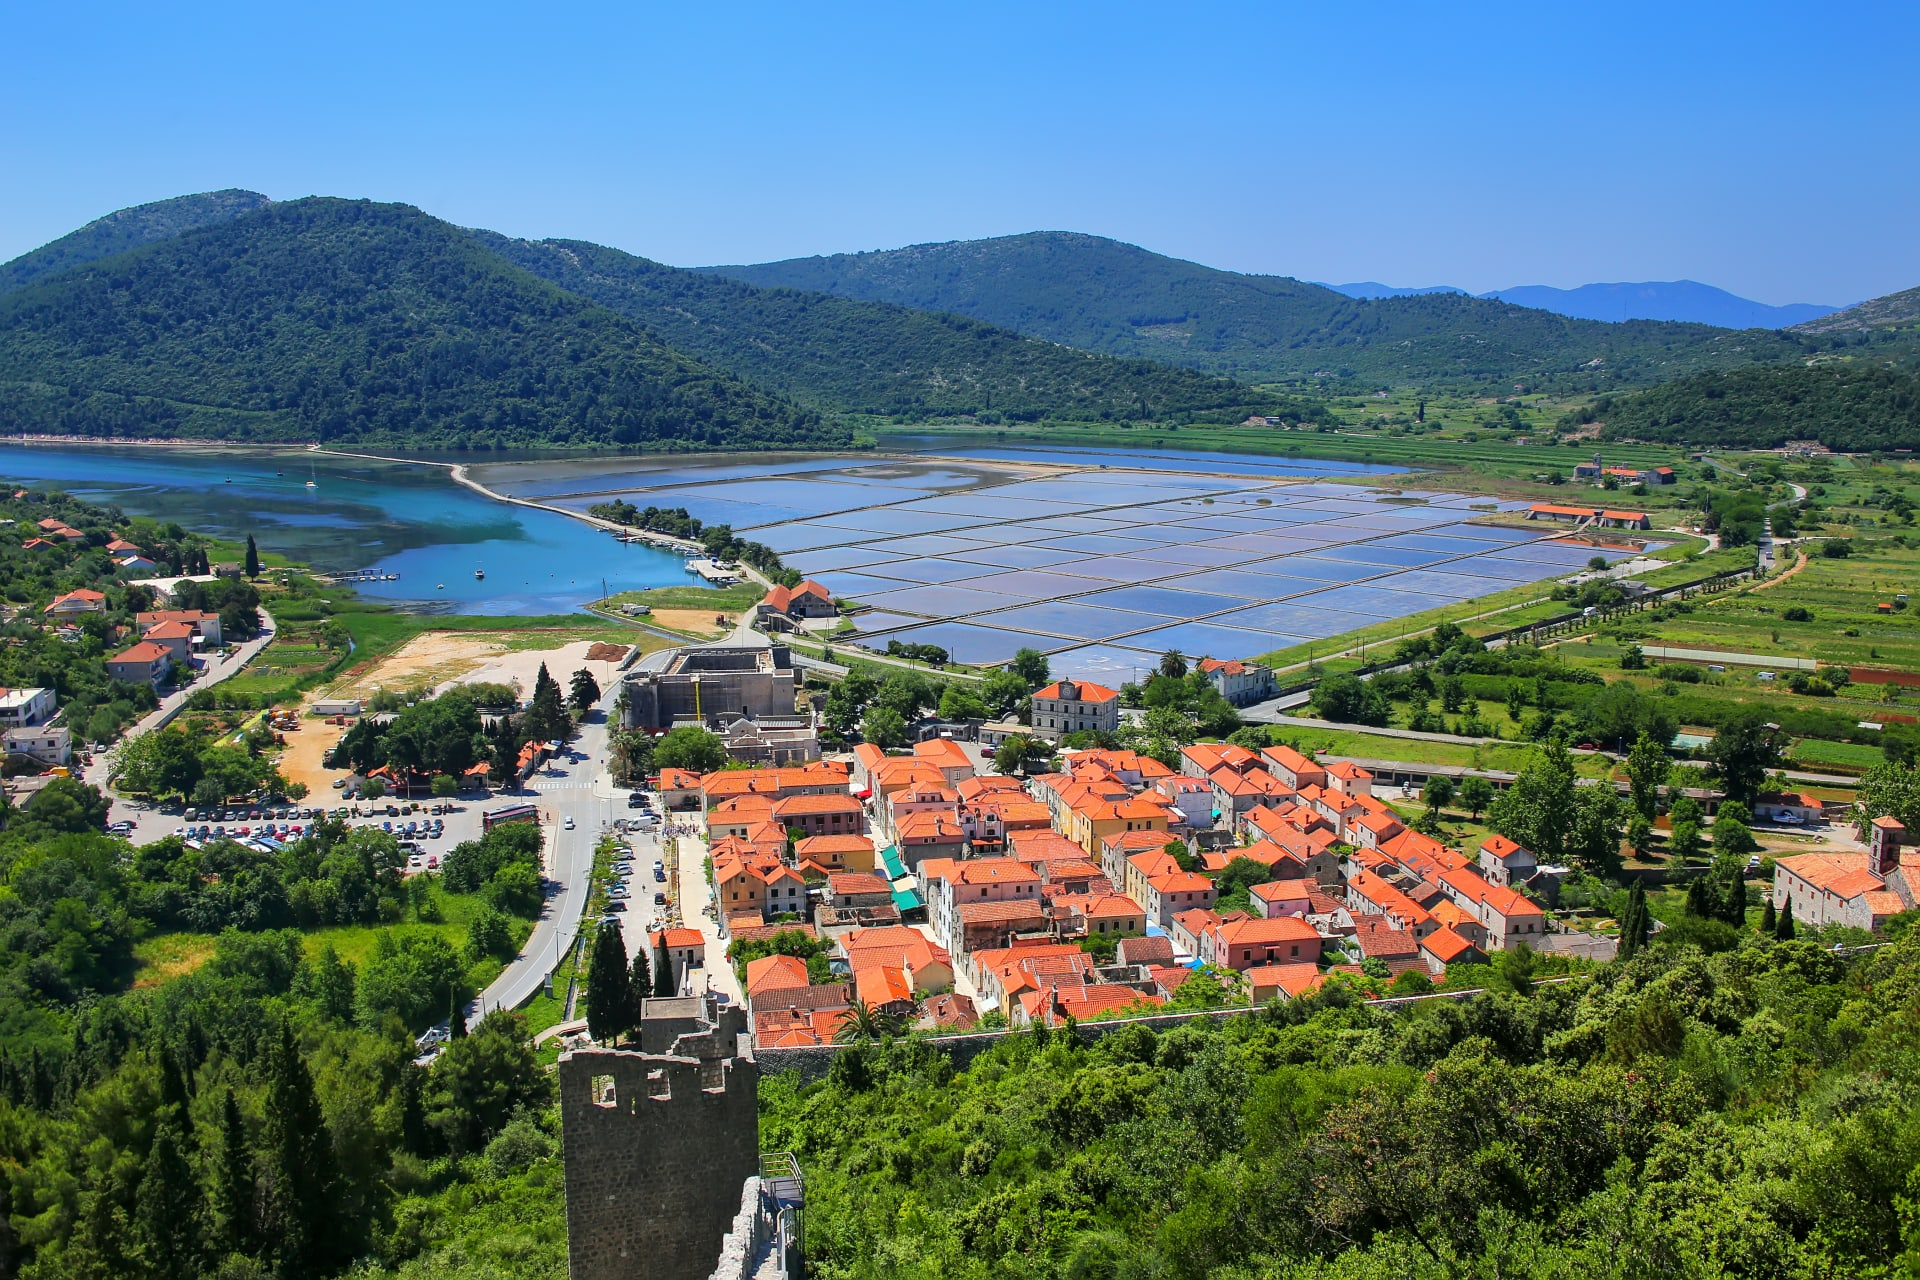 Dubrovnik - Ston, stone, salt, oysters & wine.